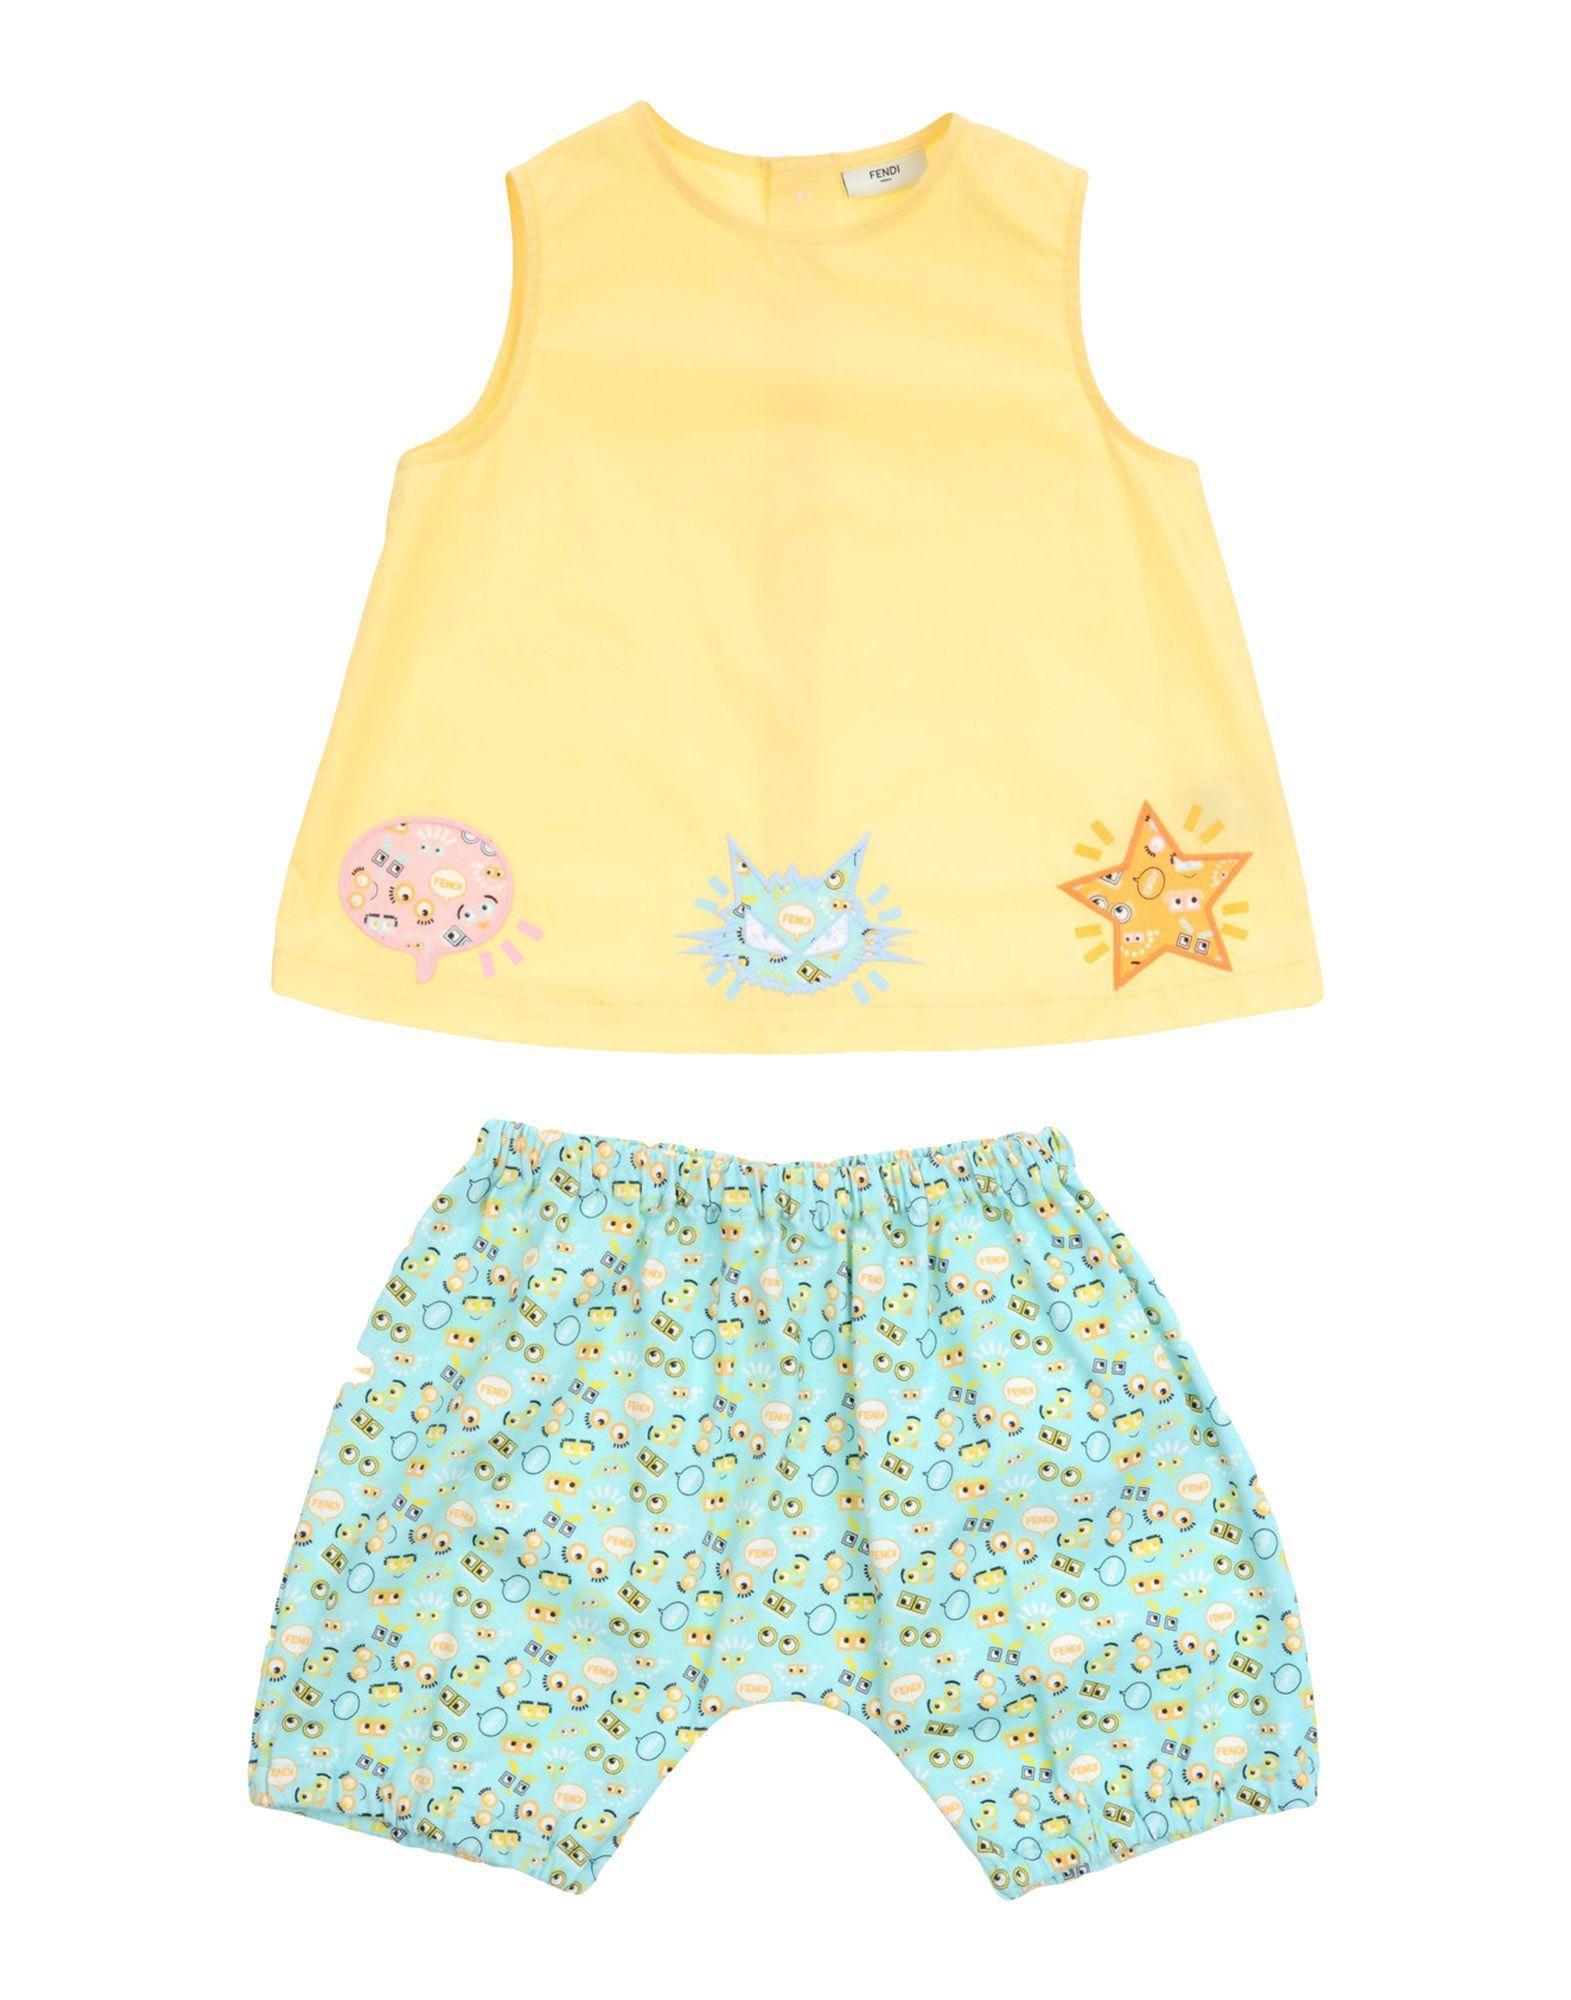 Fendi Yellow Girl Cotton Set